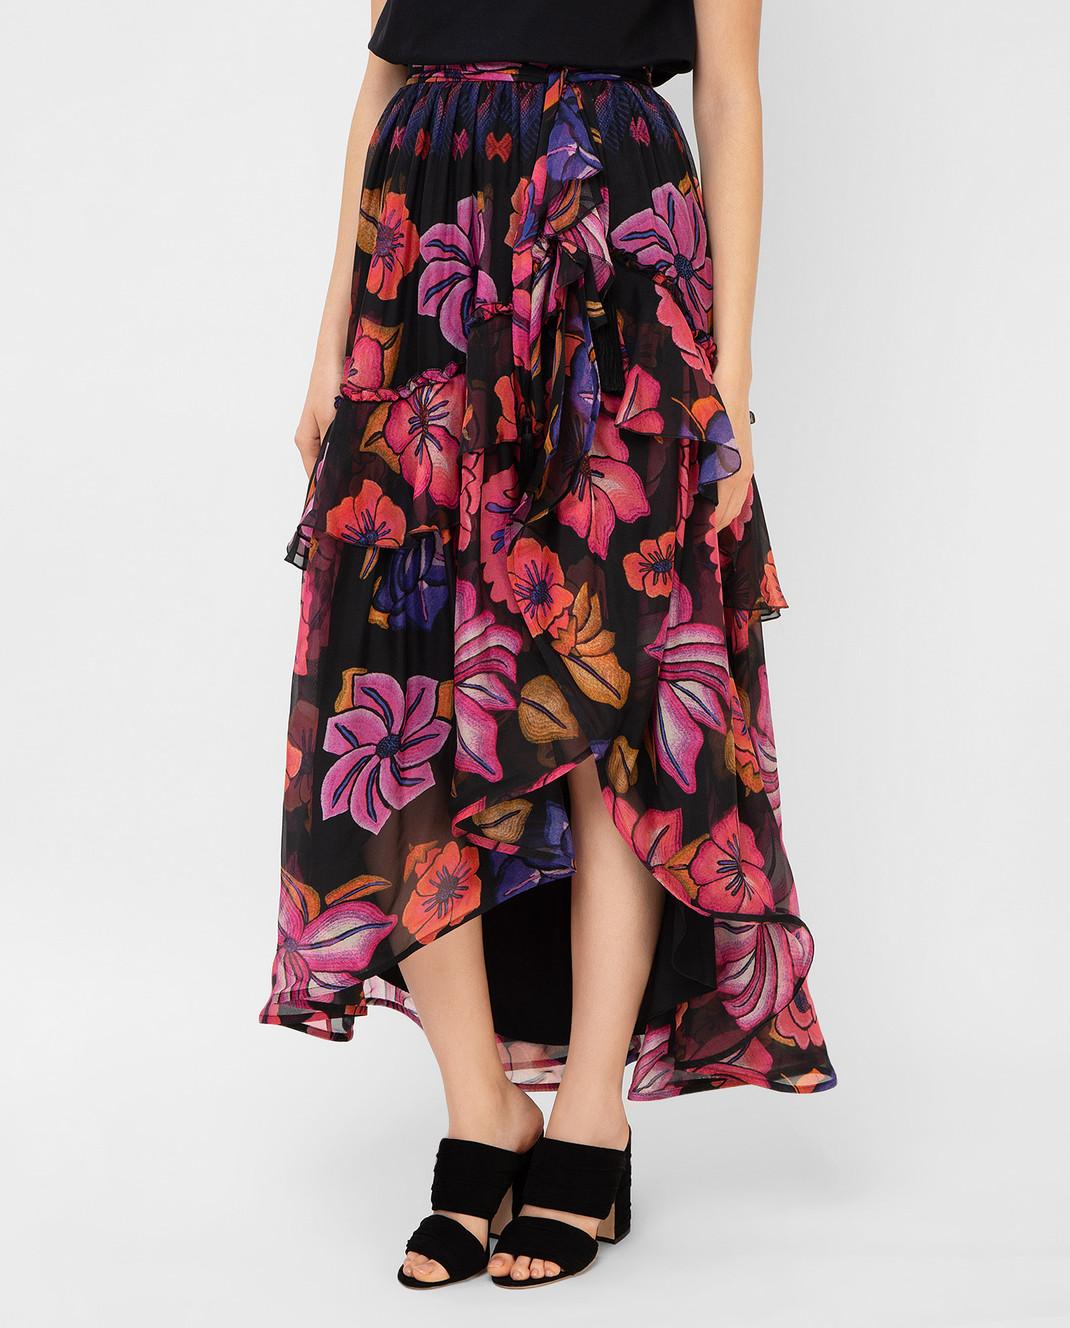 Alberta Ferretti Черная юбка из шелка A0122 изображение 3